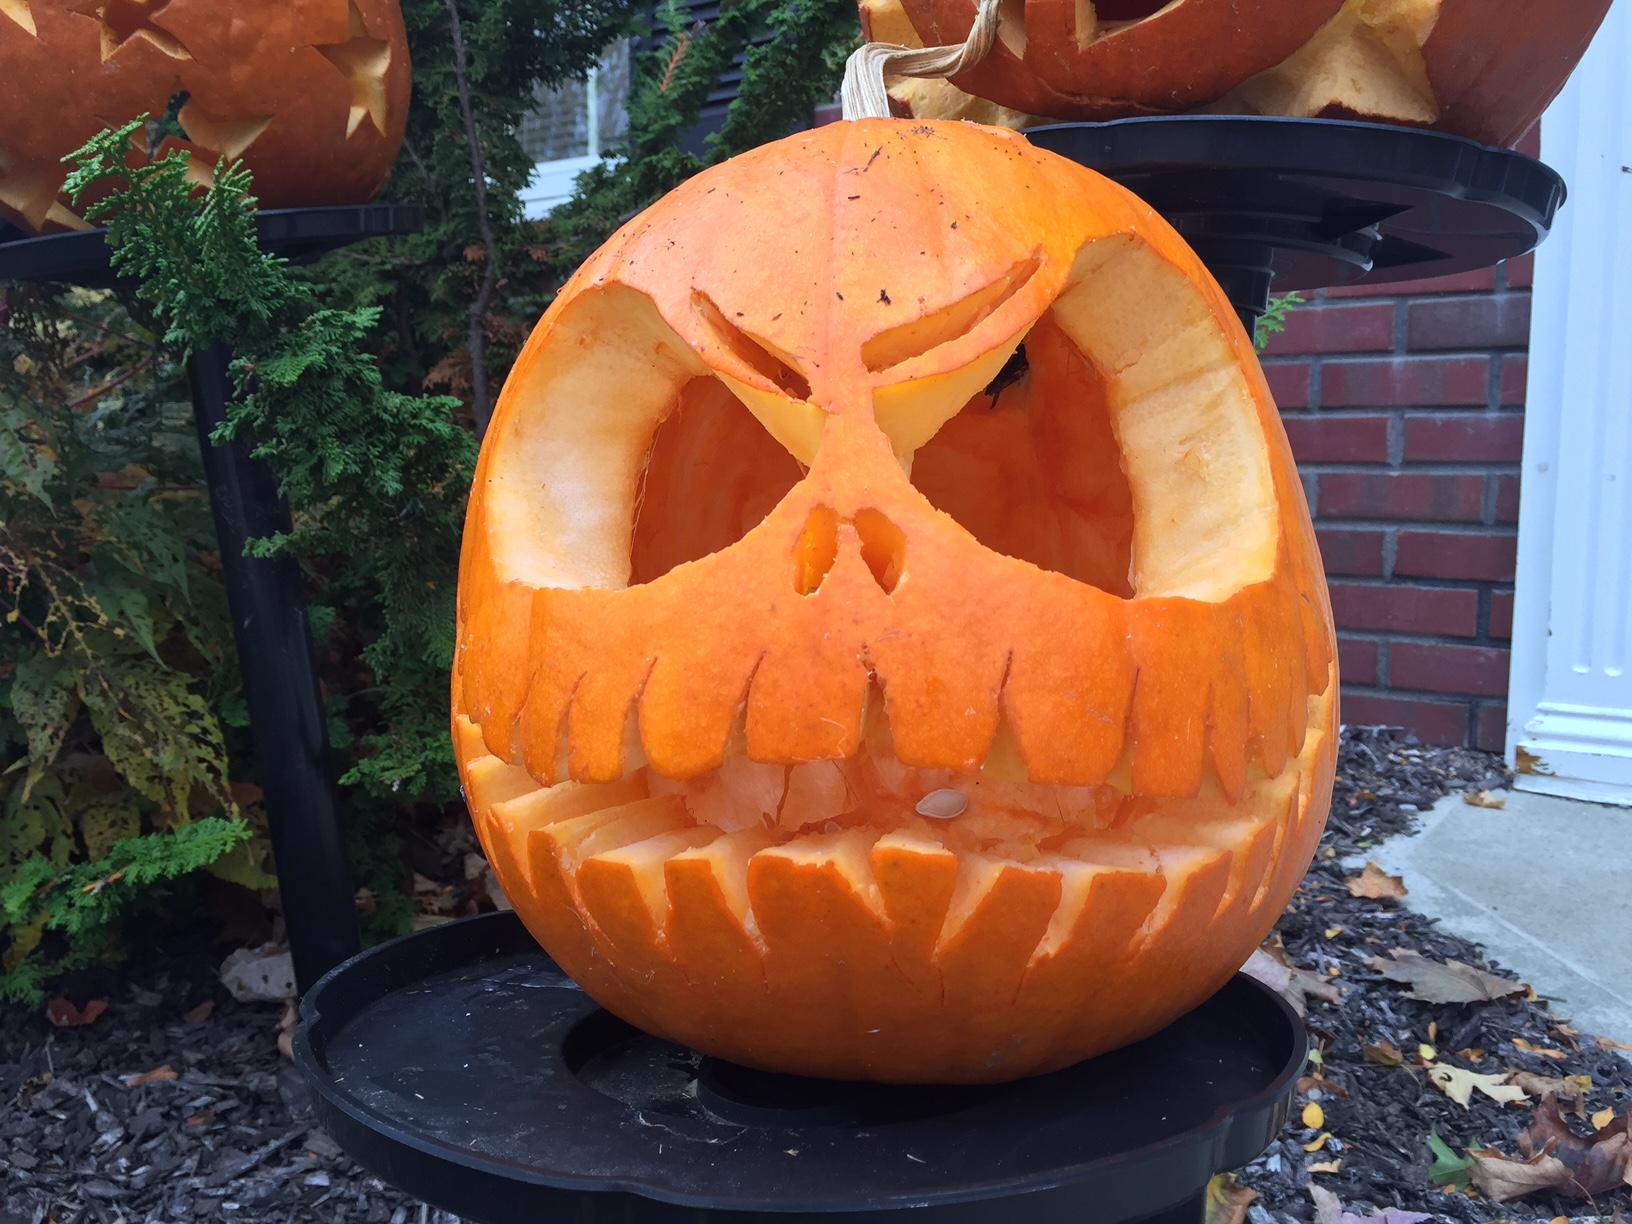 Pumpkin Carving Pra Policy Research Associates